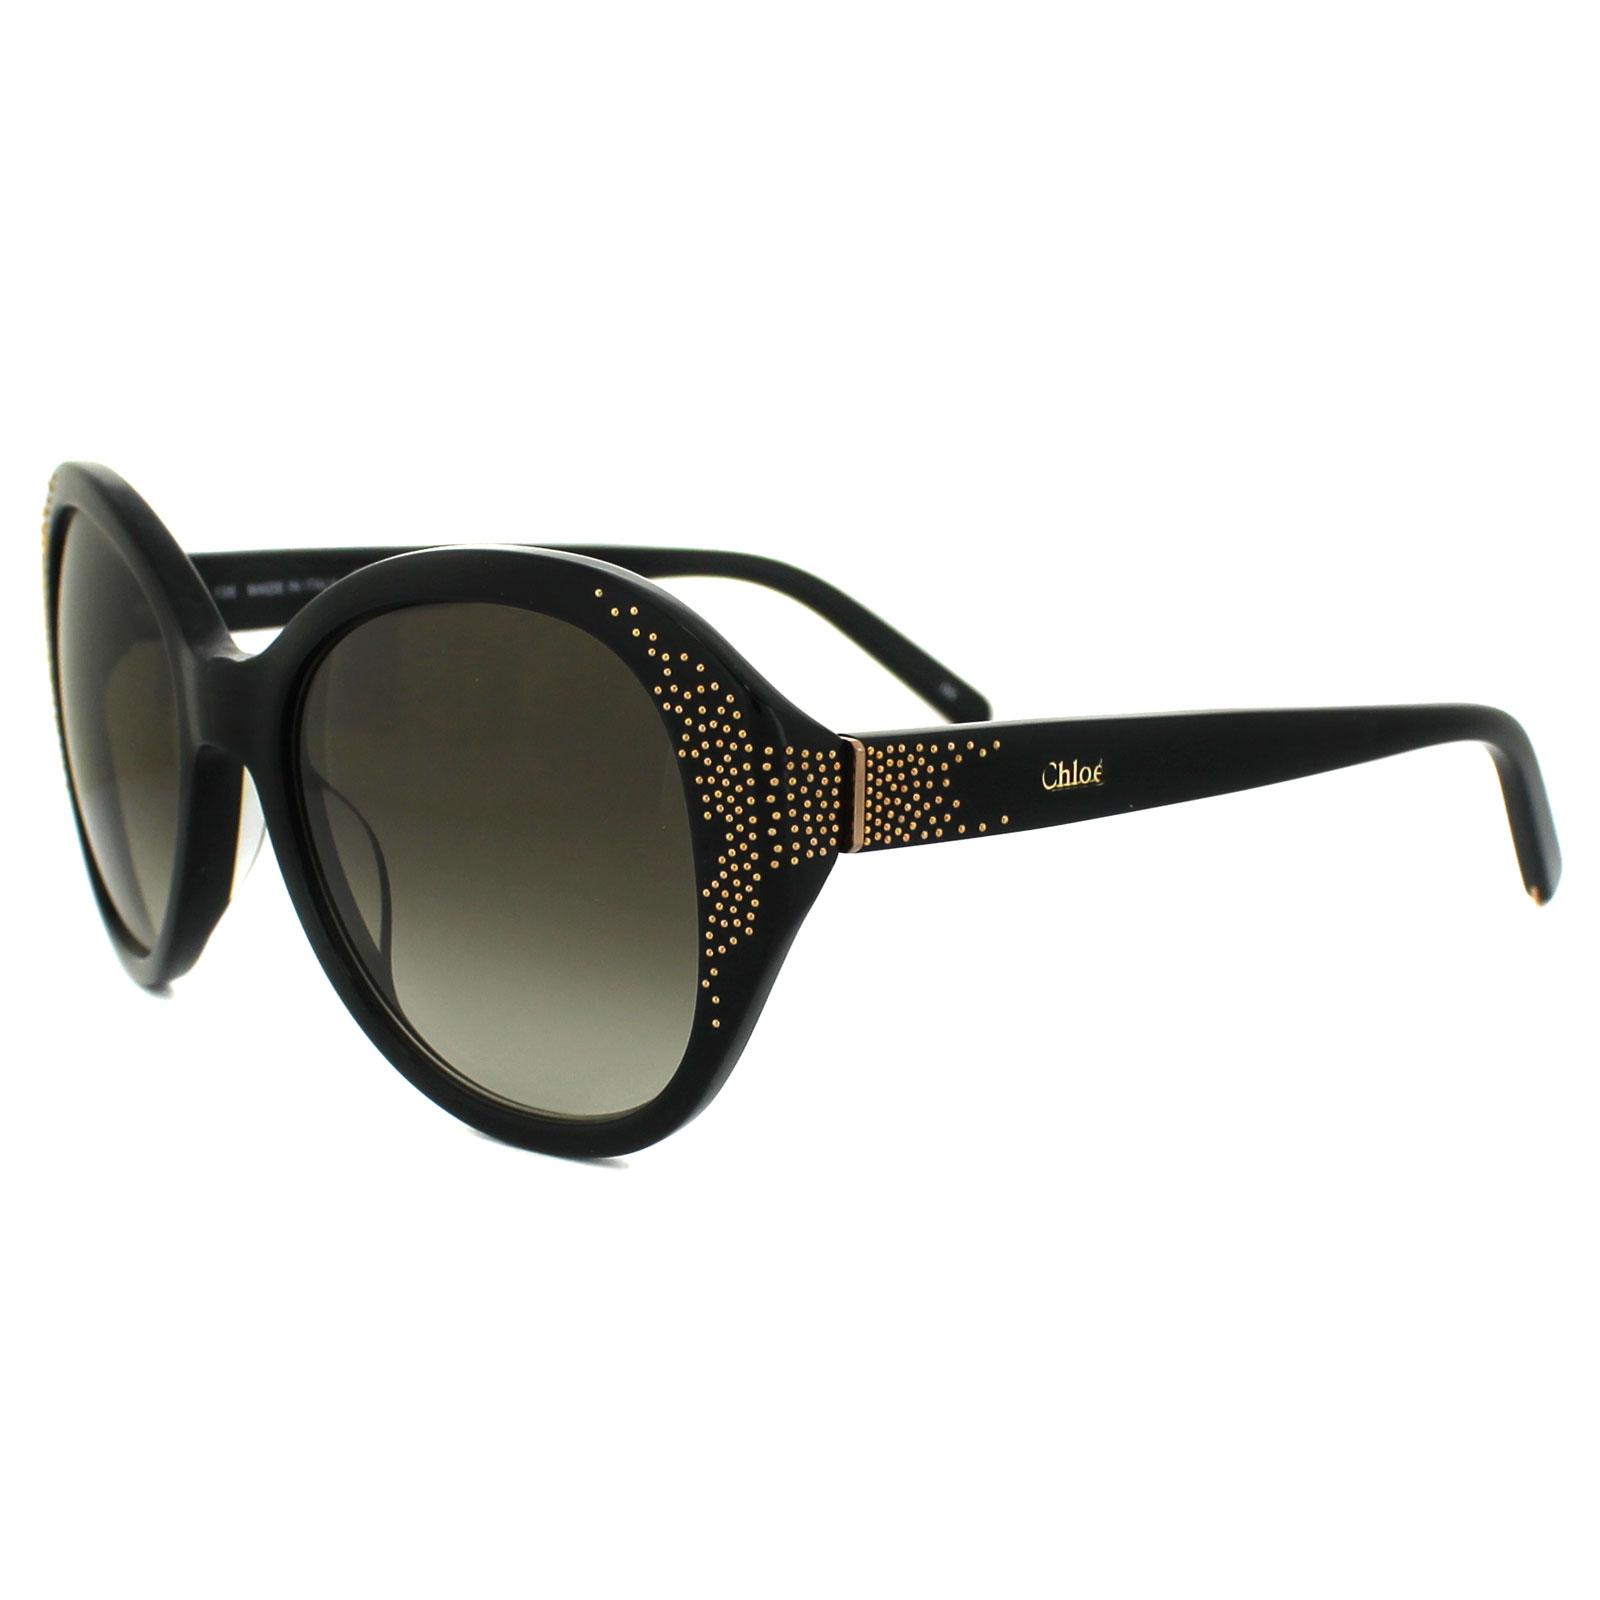 50c985688d7 Cheap Chloe CE 628S Sunglasses - Discounted Sunglasses